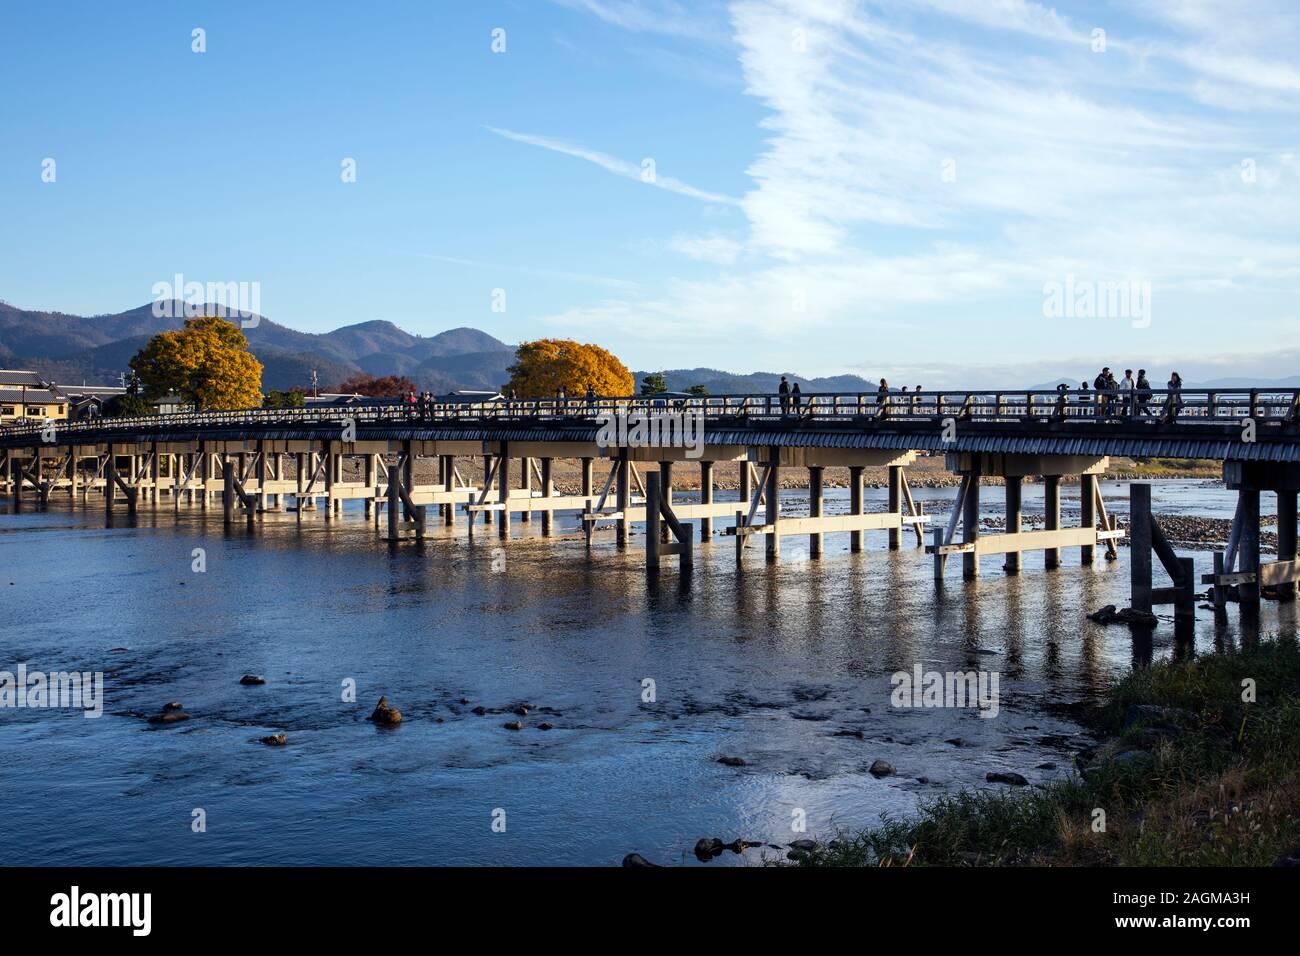 KYOTO, JAPAN -23th  November 2019: Arashiyama is an area in western Kyoto centered around the Katsura River and surrounding mountains Stock Photo